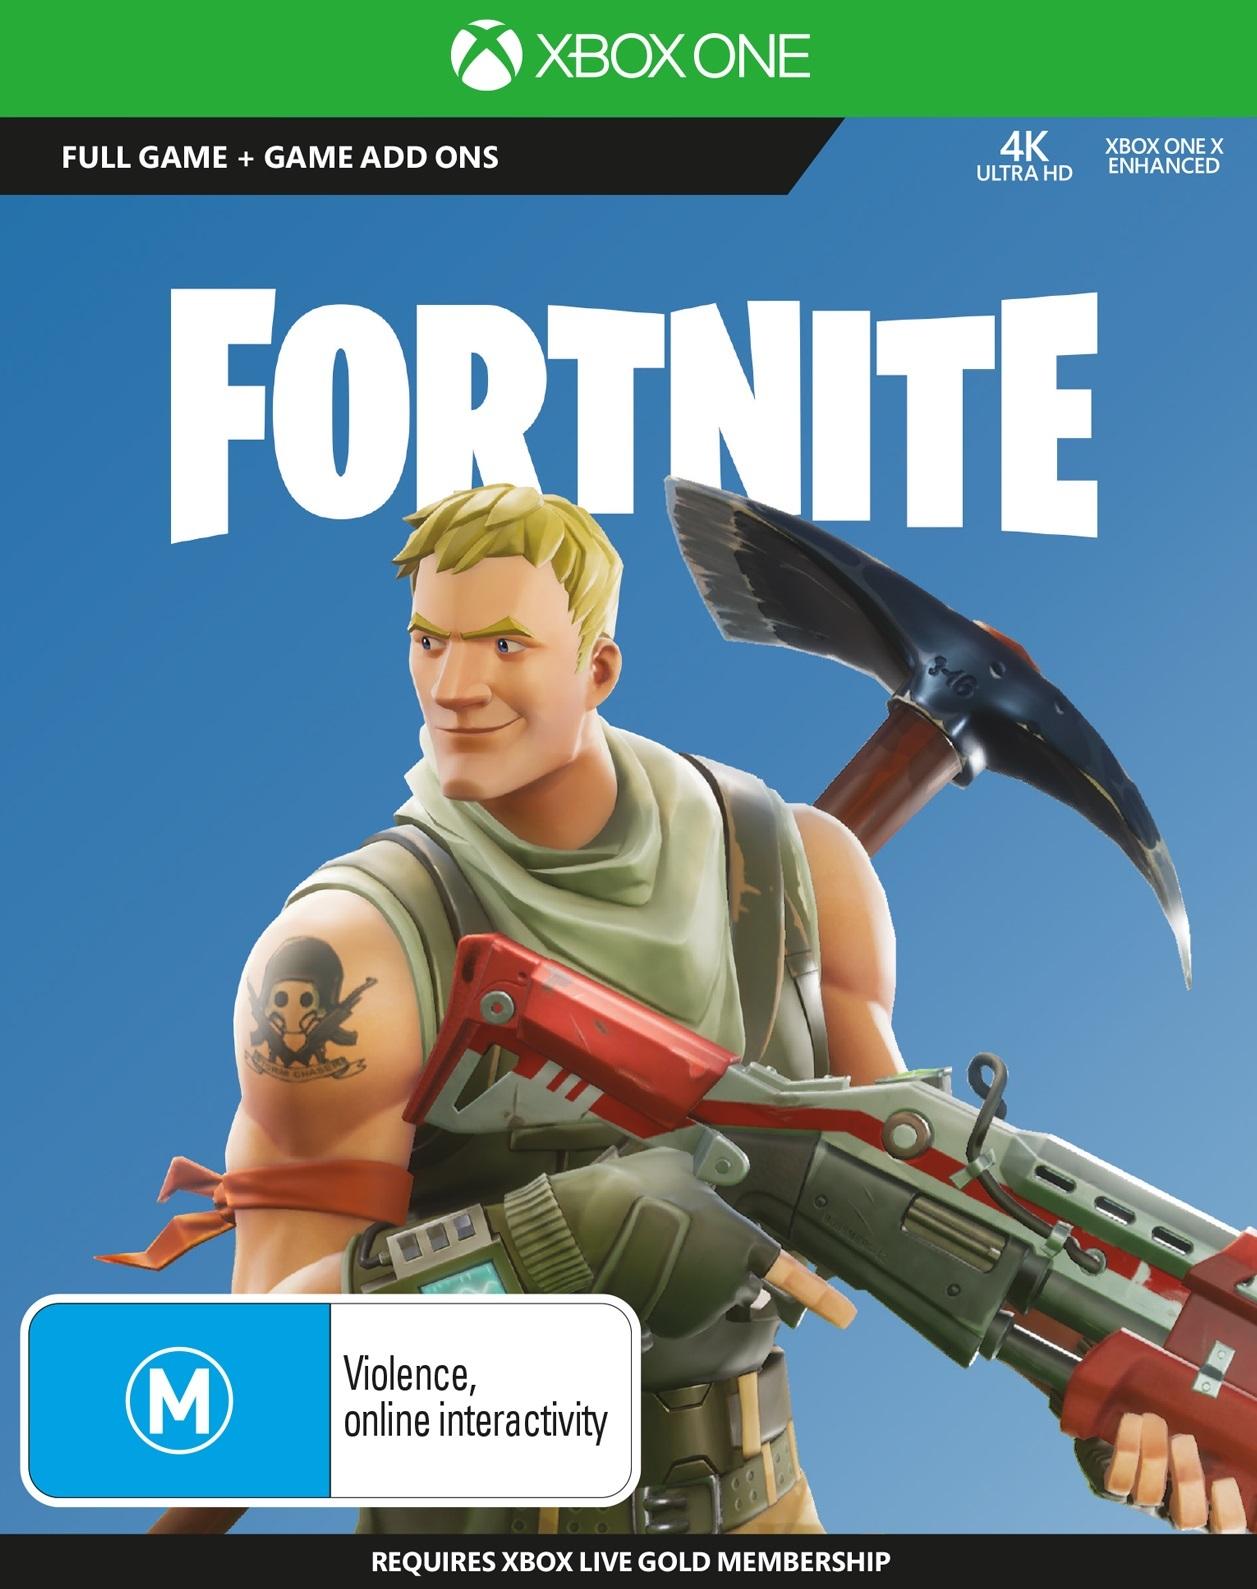 Fortnite full game download